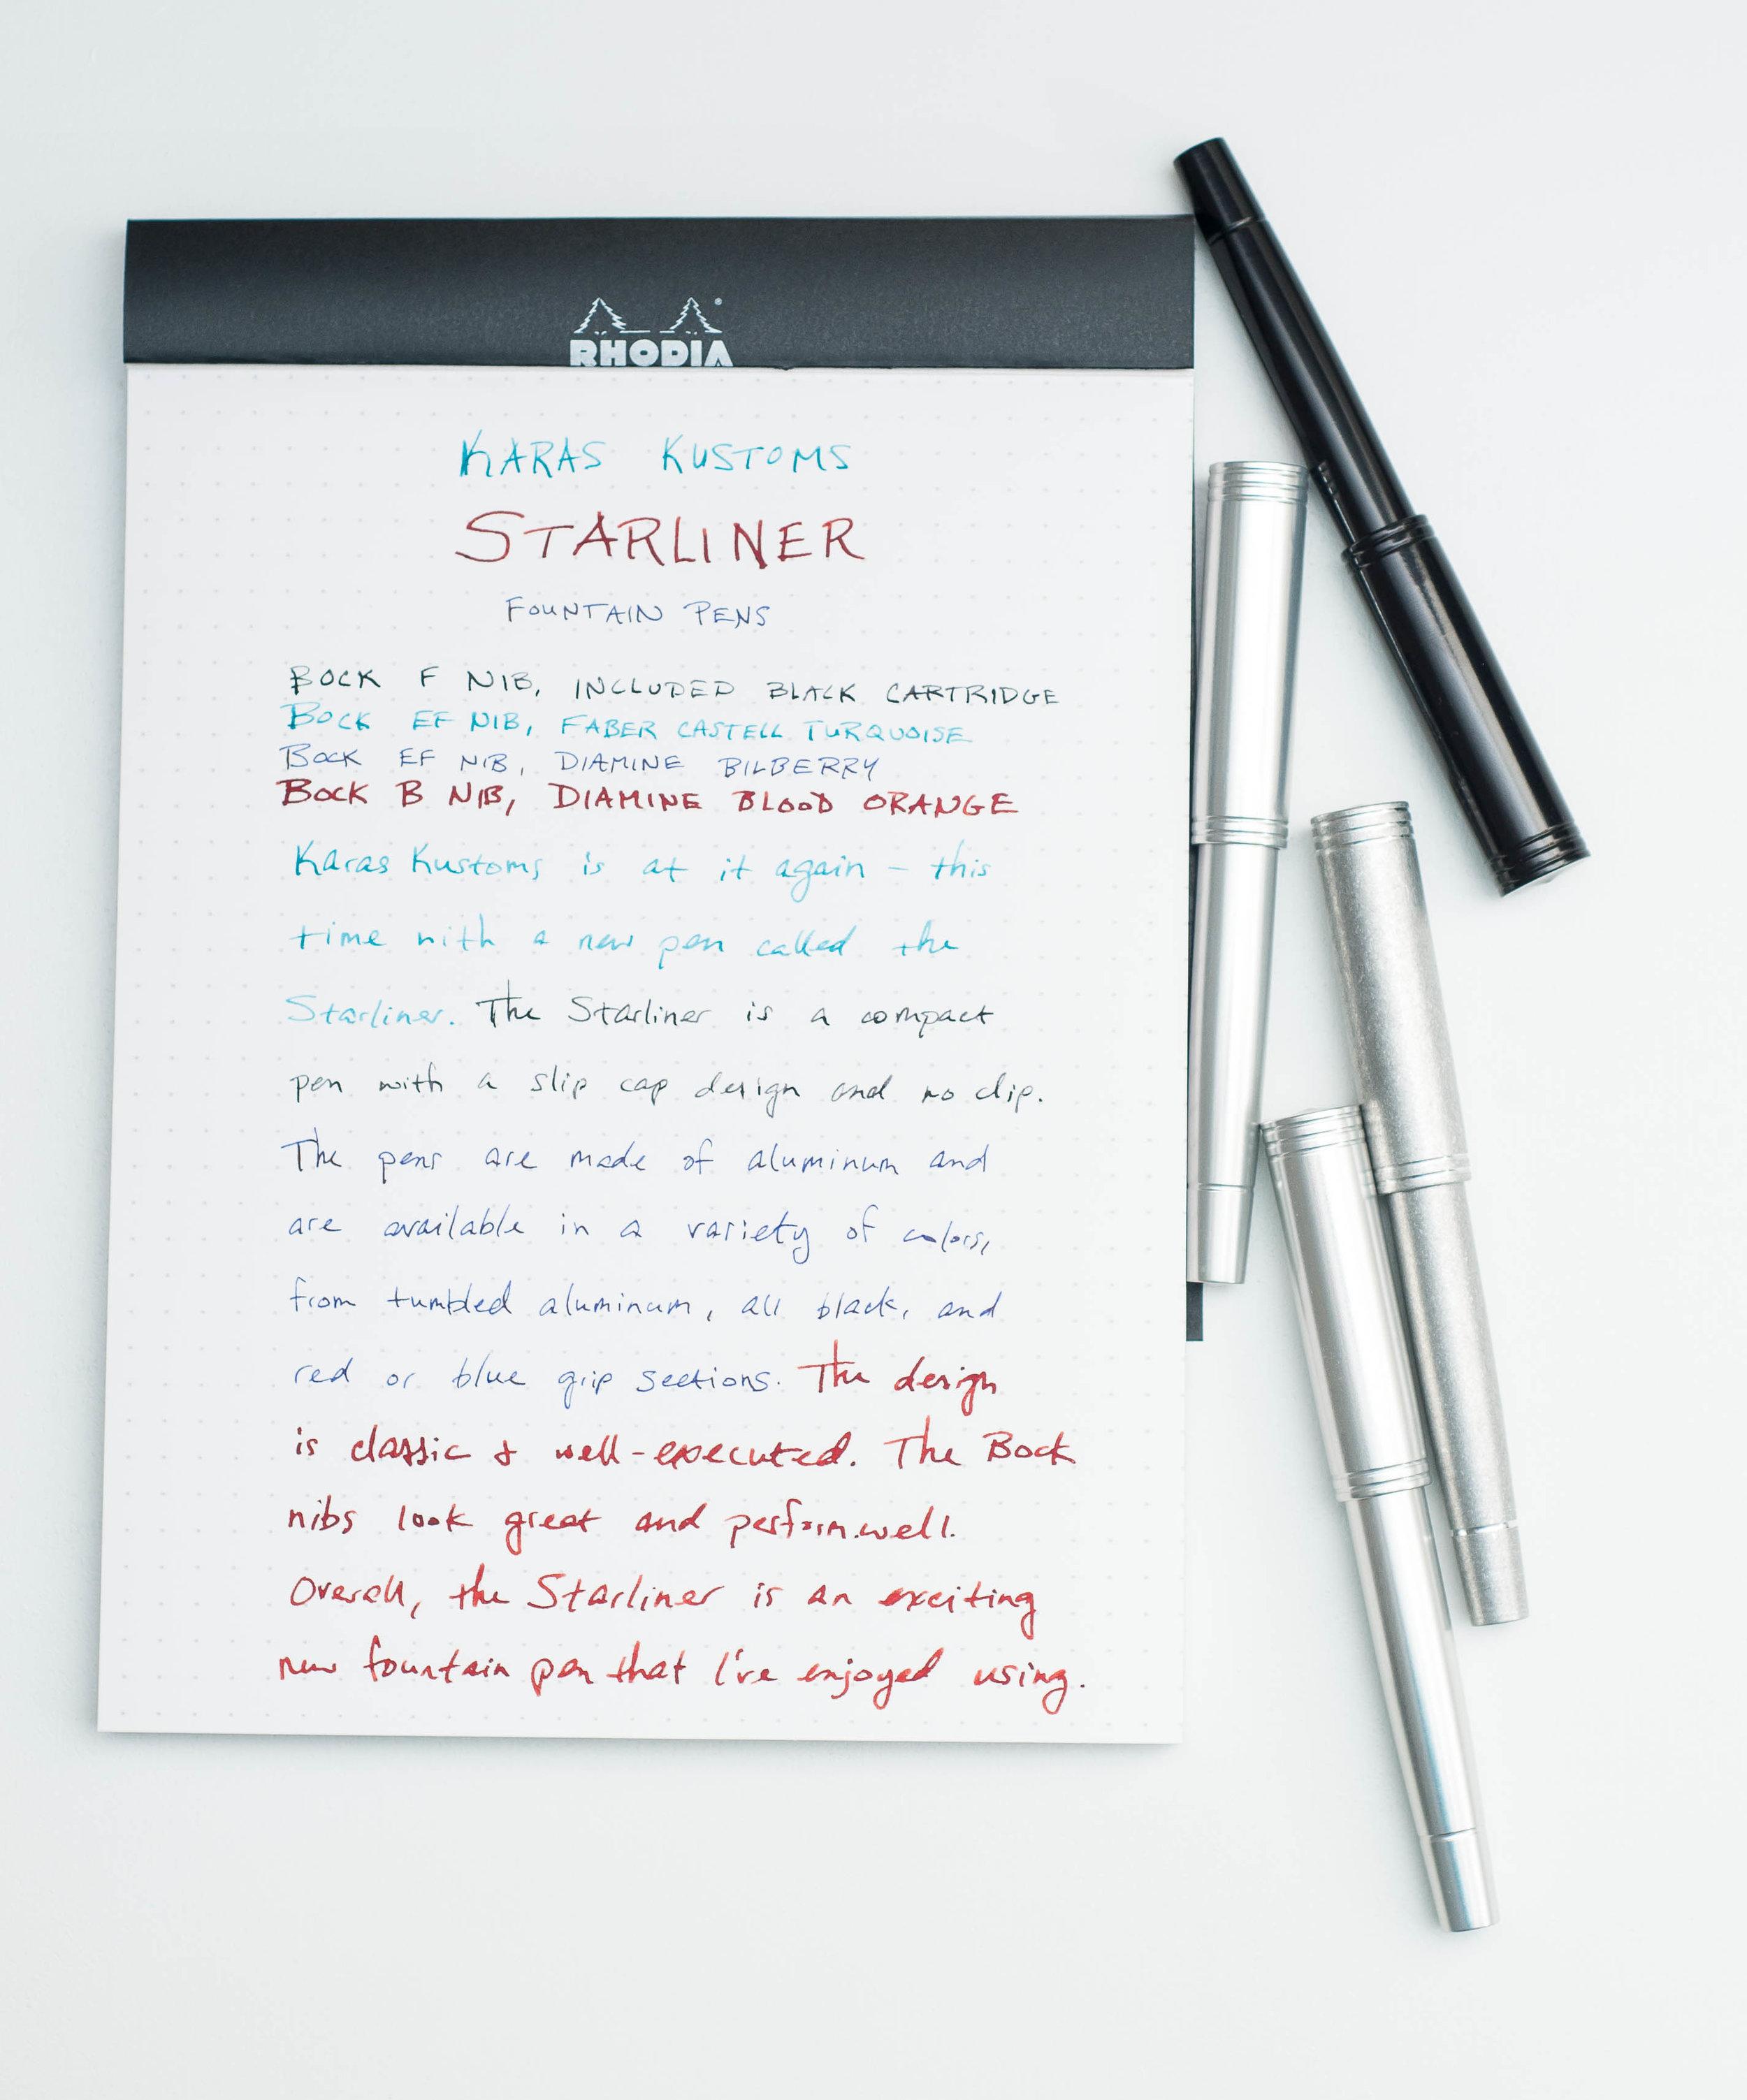 Karas Kustoms Starliner Fountain Pen Writing